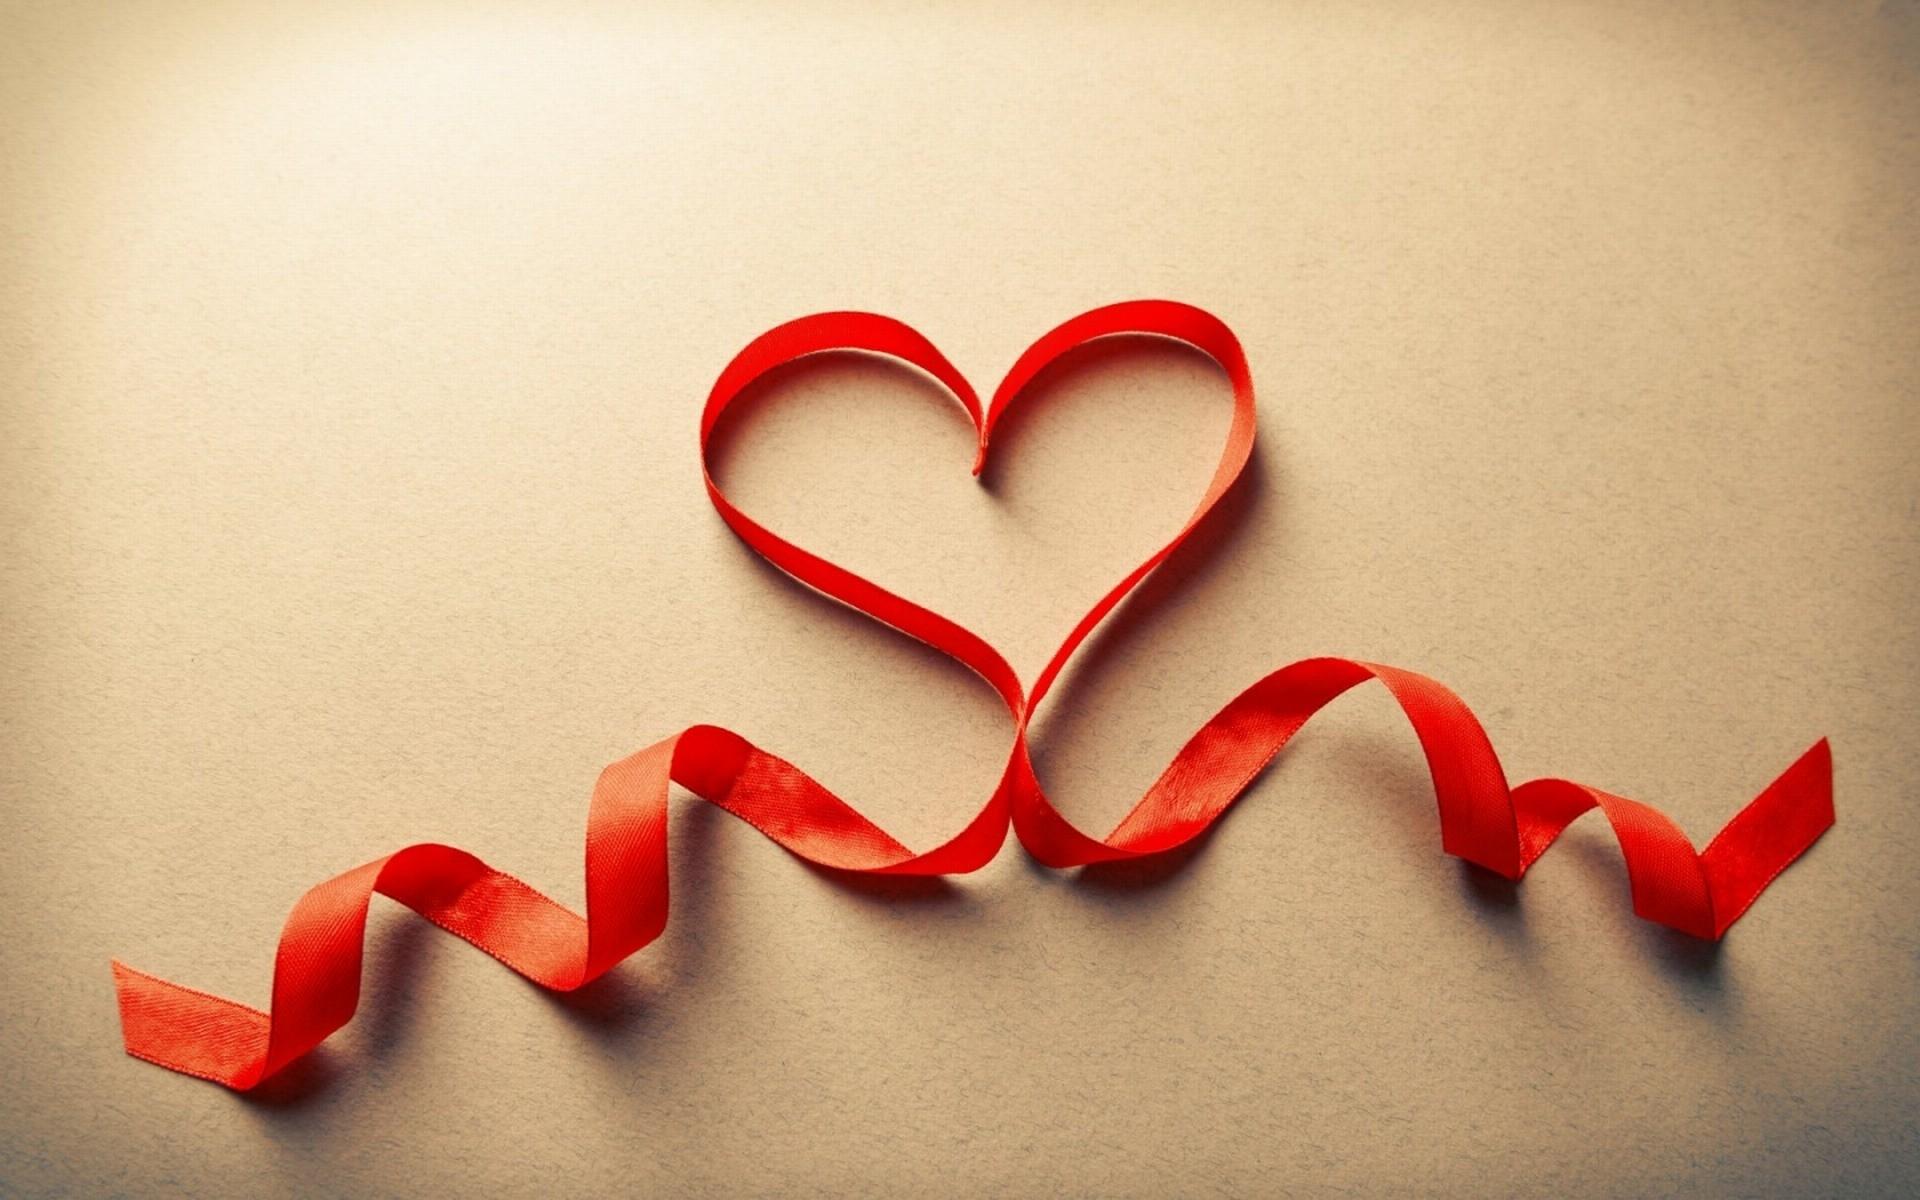 Love hd wallpaper 74 images - Love wallpaper hd ...